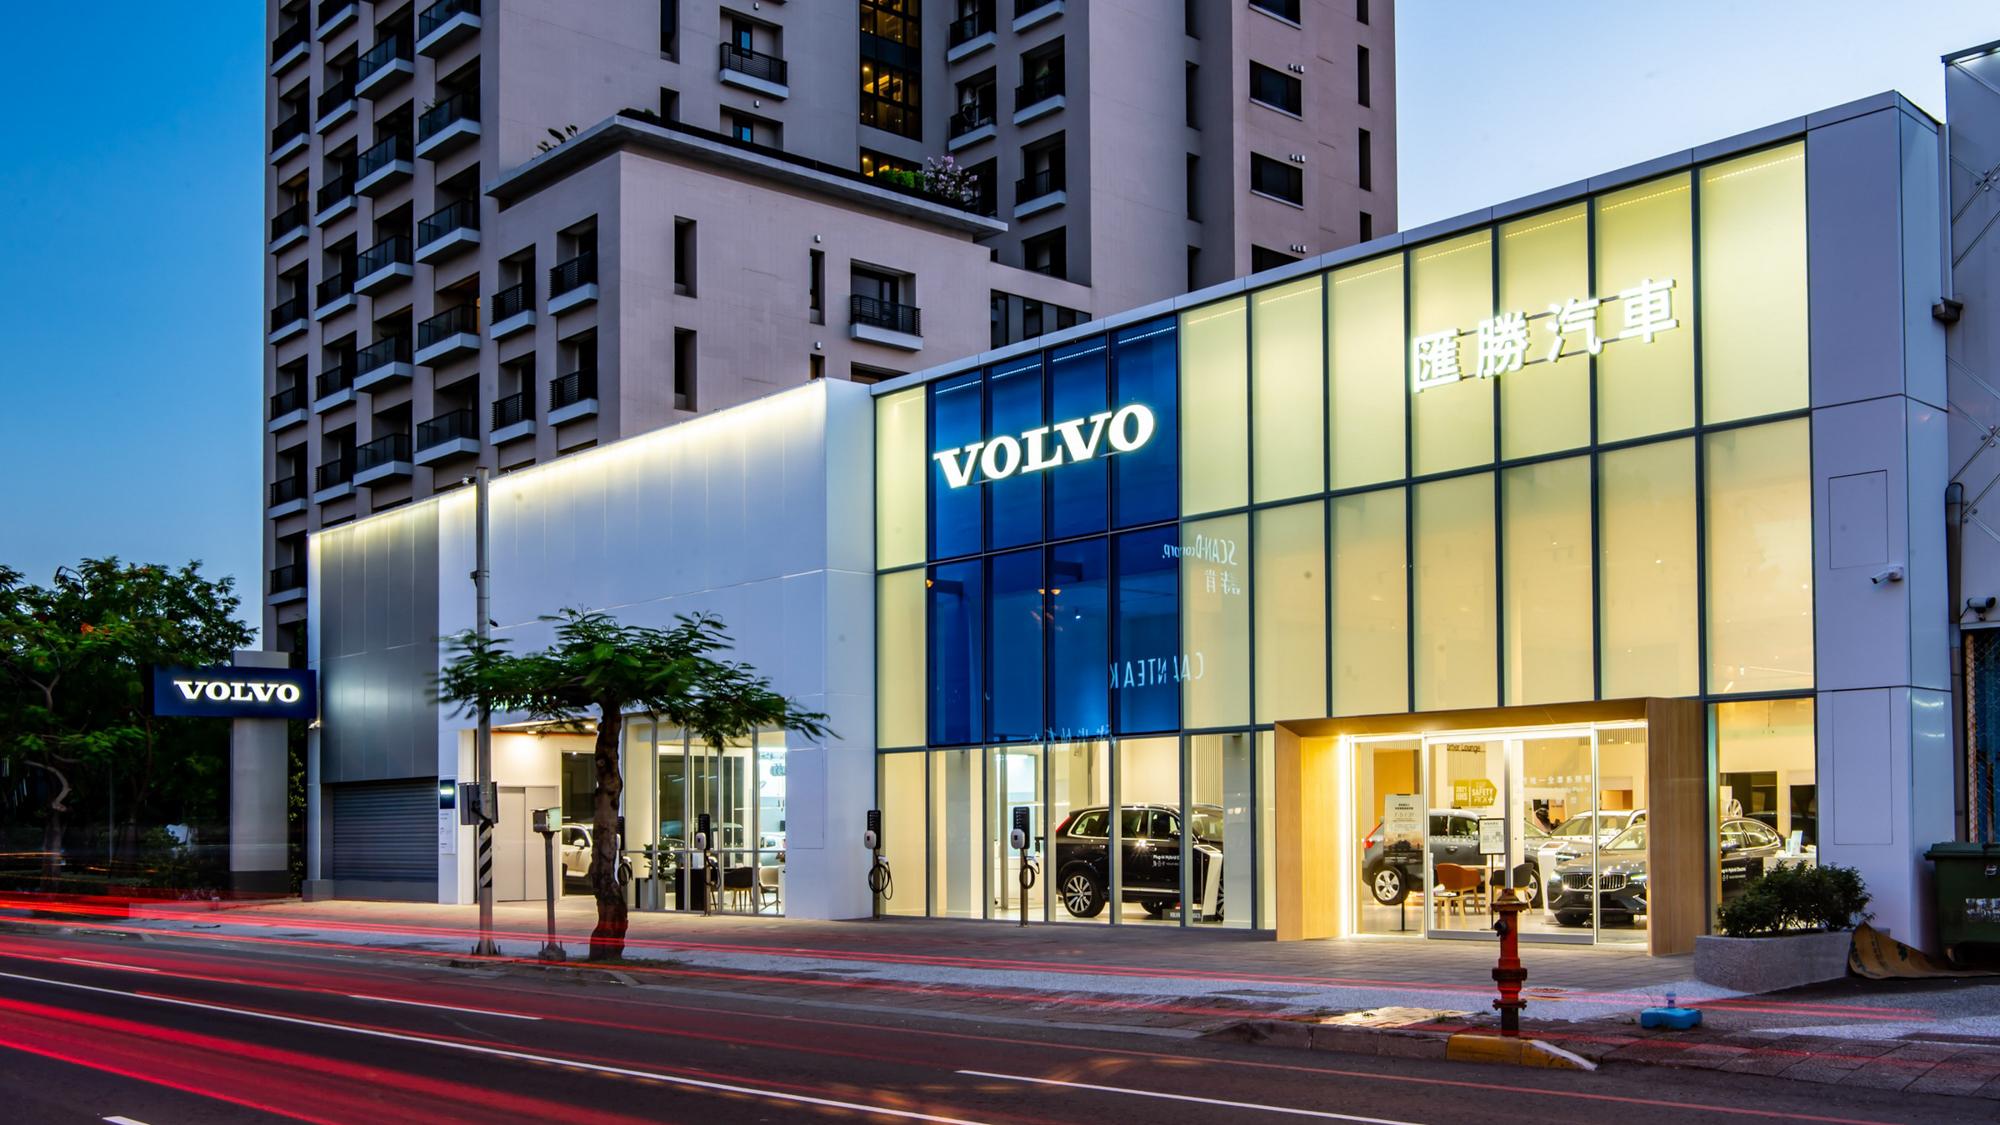 Volvo 台南匯勝汽車中華展示暨服務中心隆重開幕